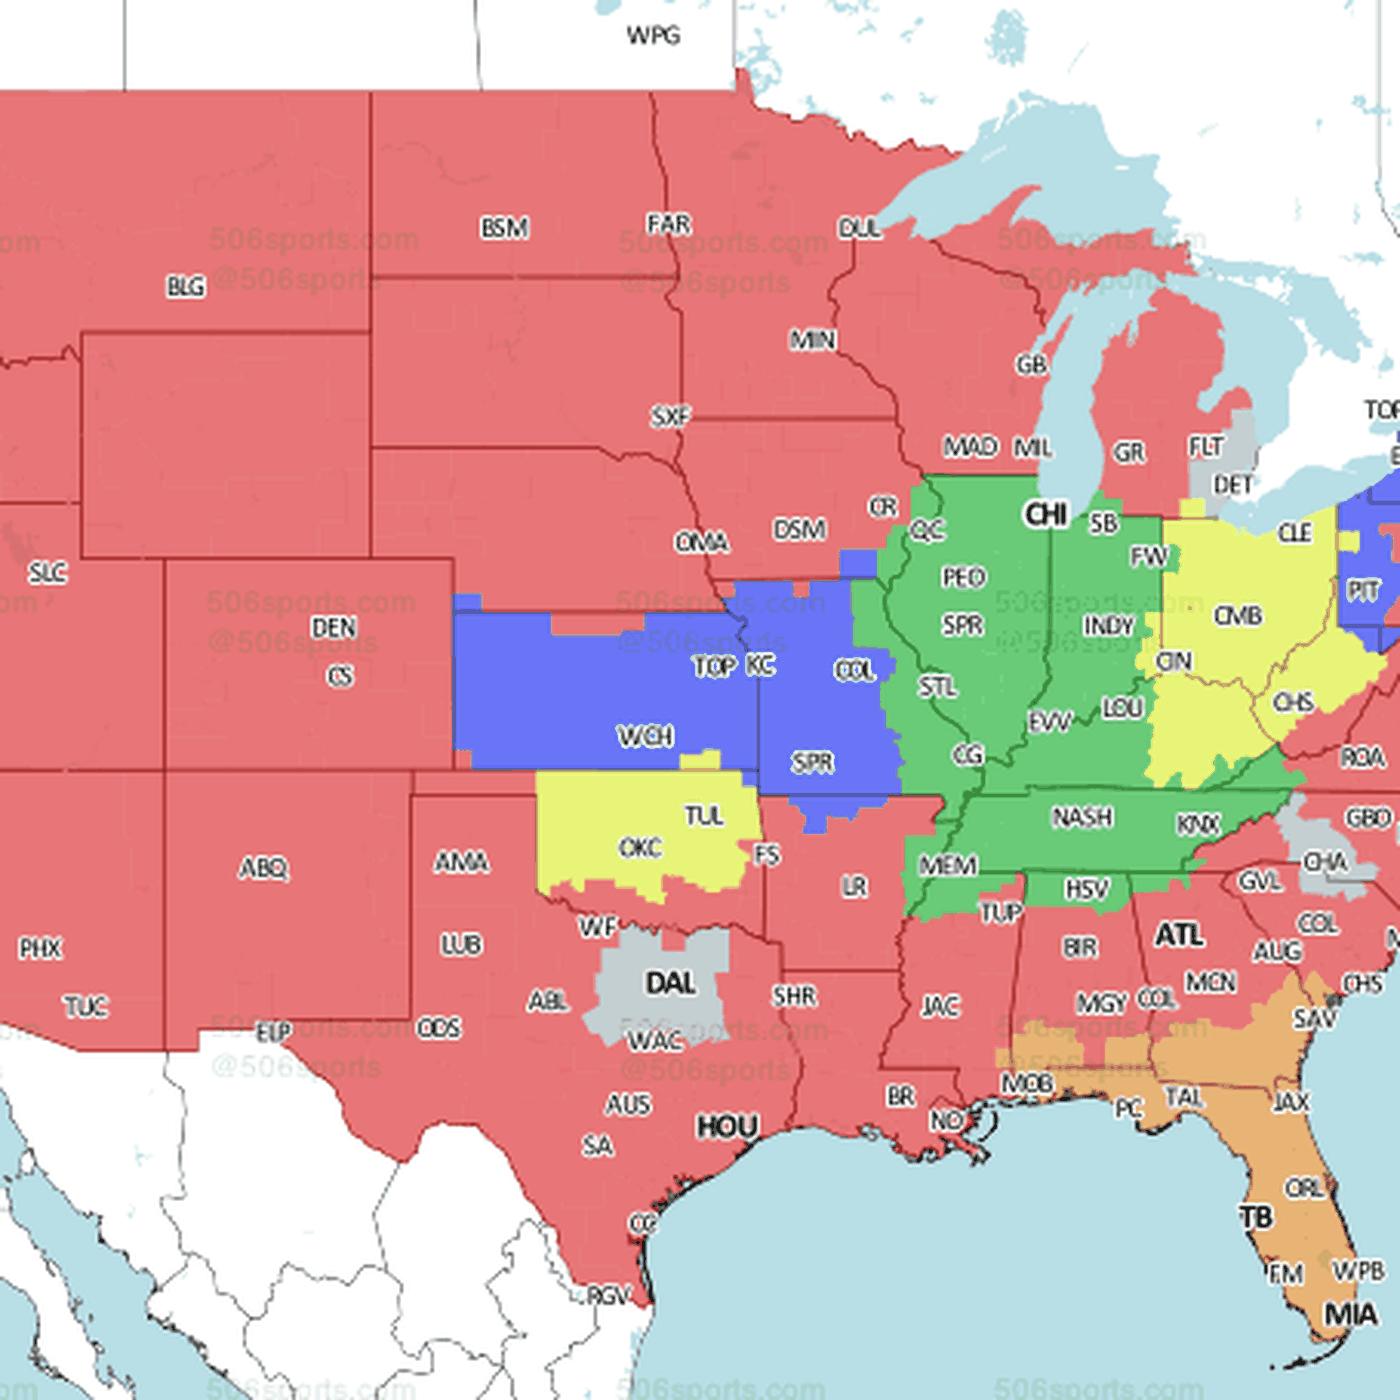 Jacksonville Jaguars vs. Miami Dolphins: Week 16 TV coverage map on on